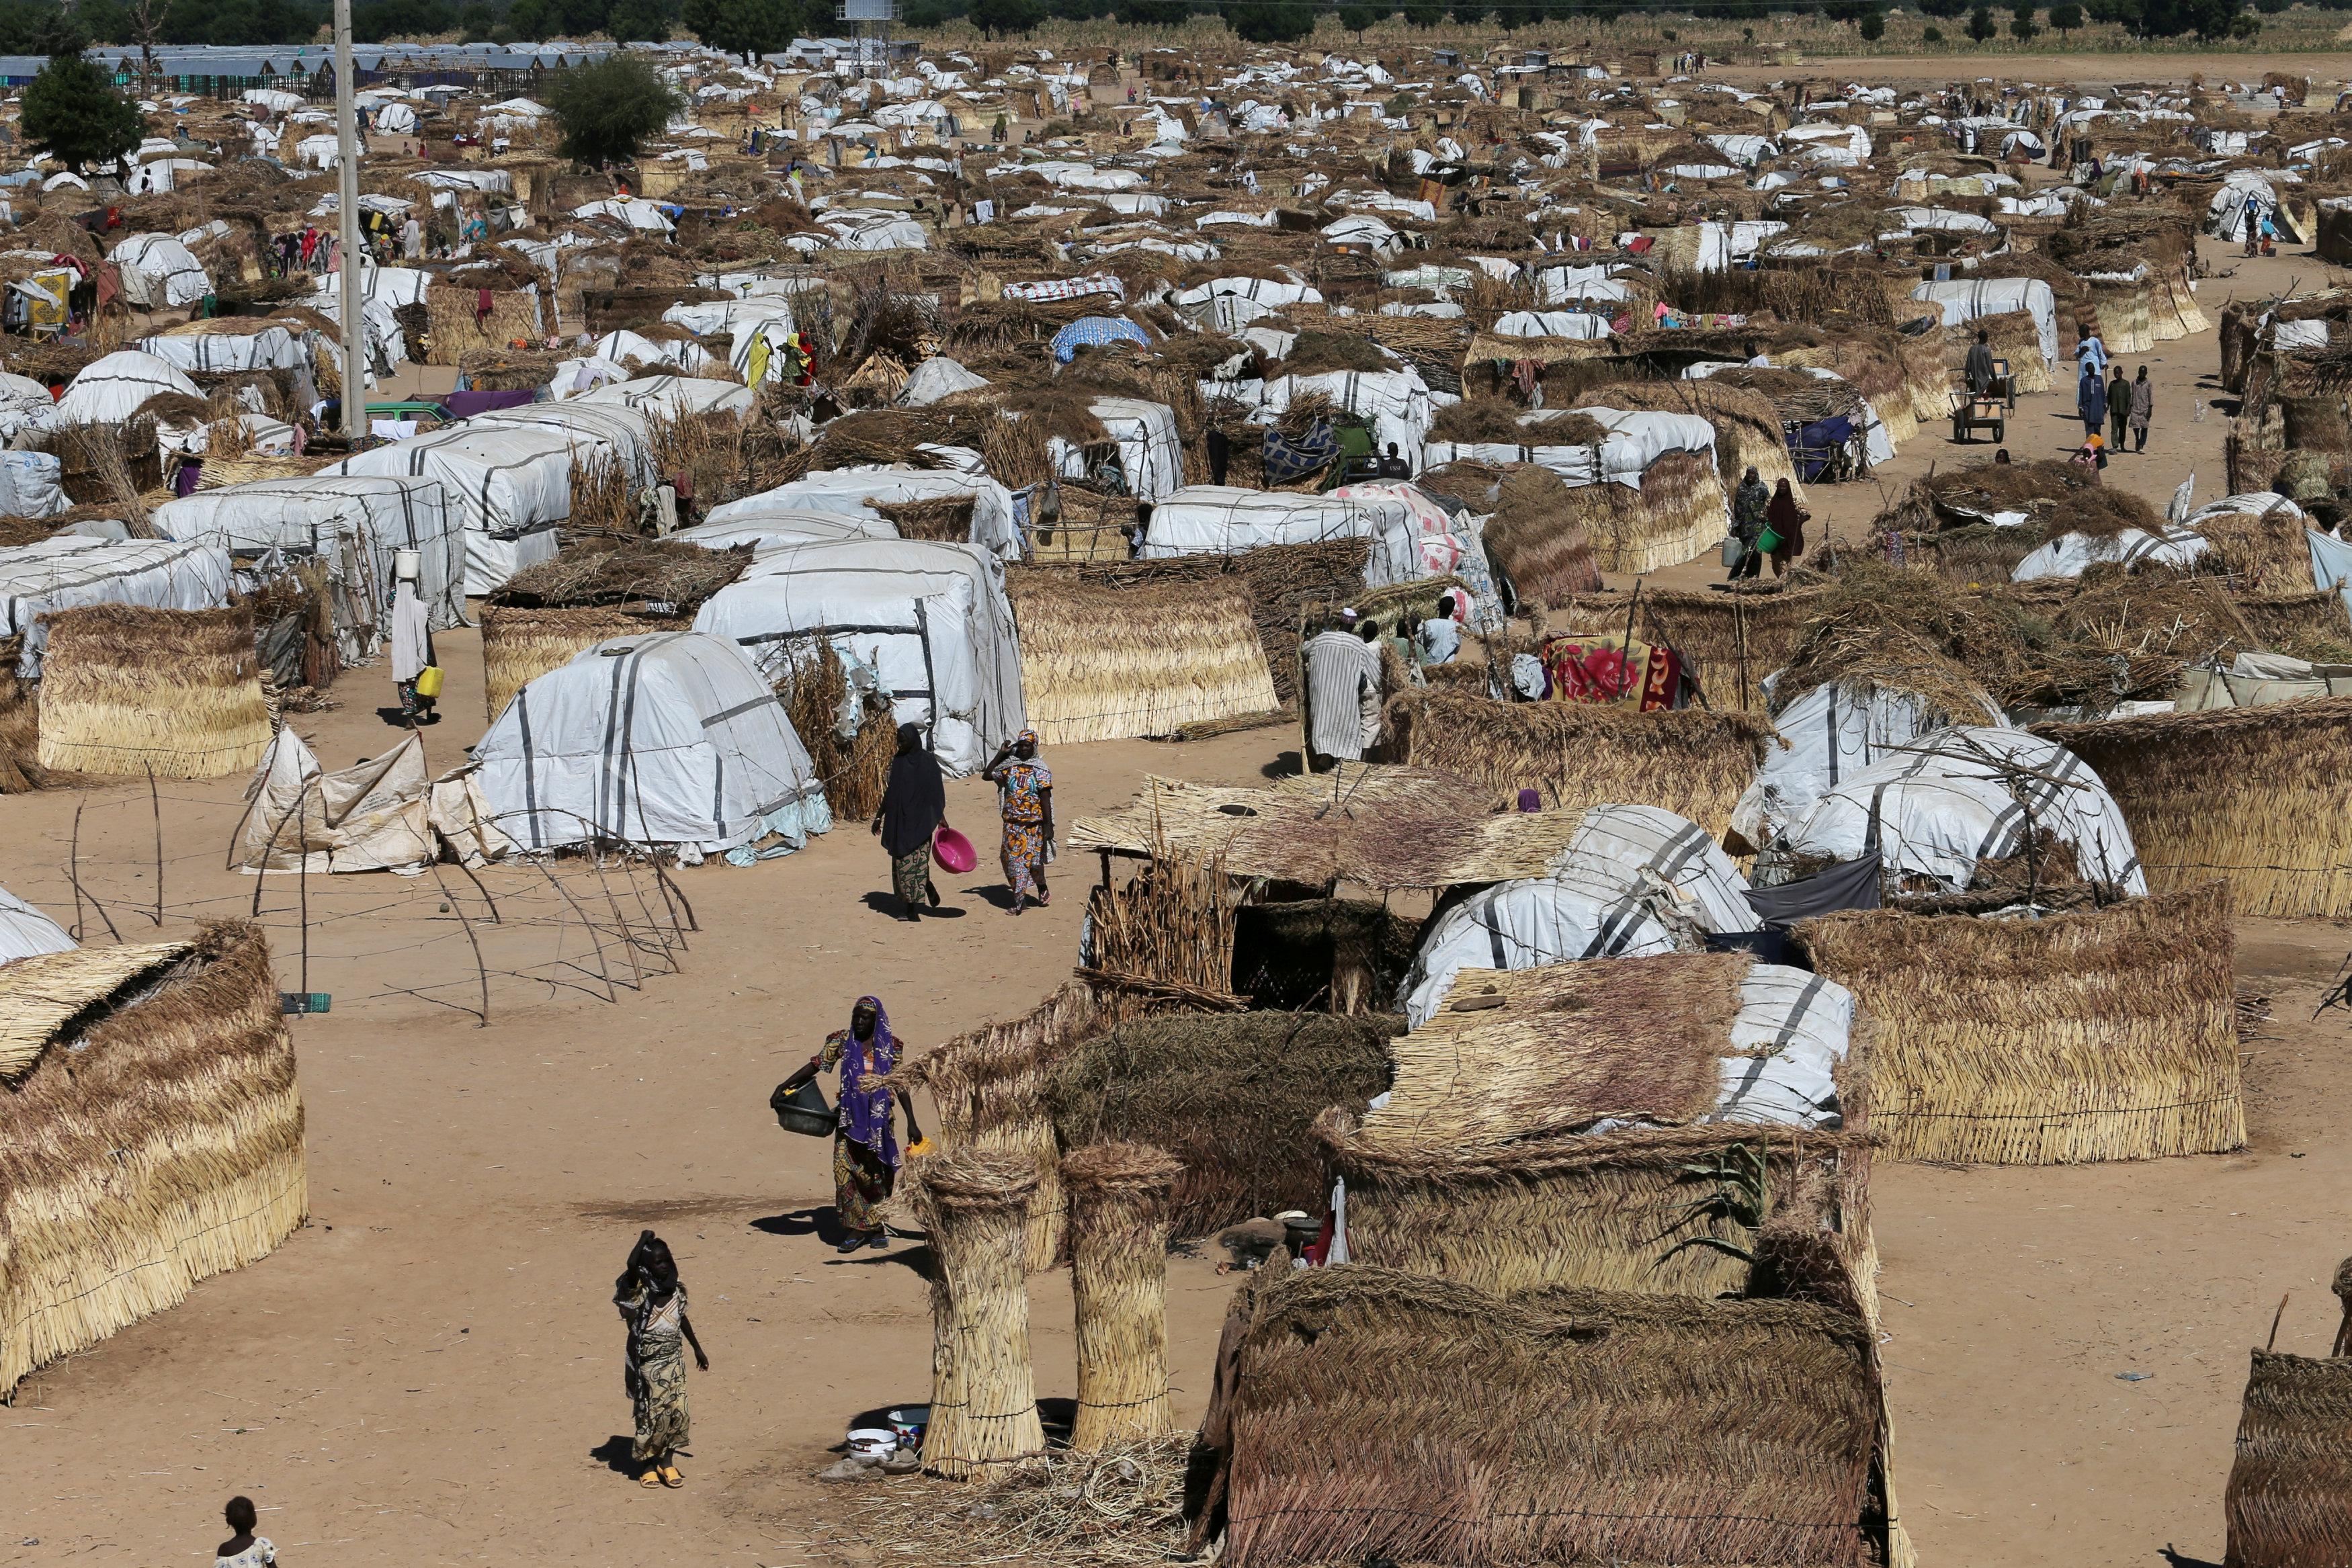 FILE PHOTO: People walk inside the Muna Internally displace people camp in Maiduguri, Nigeria December 1, 2016 REUTERS/Afolabi Sotunde/File Photo